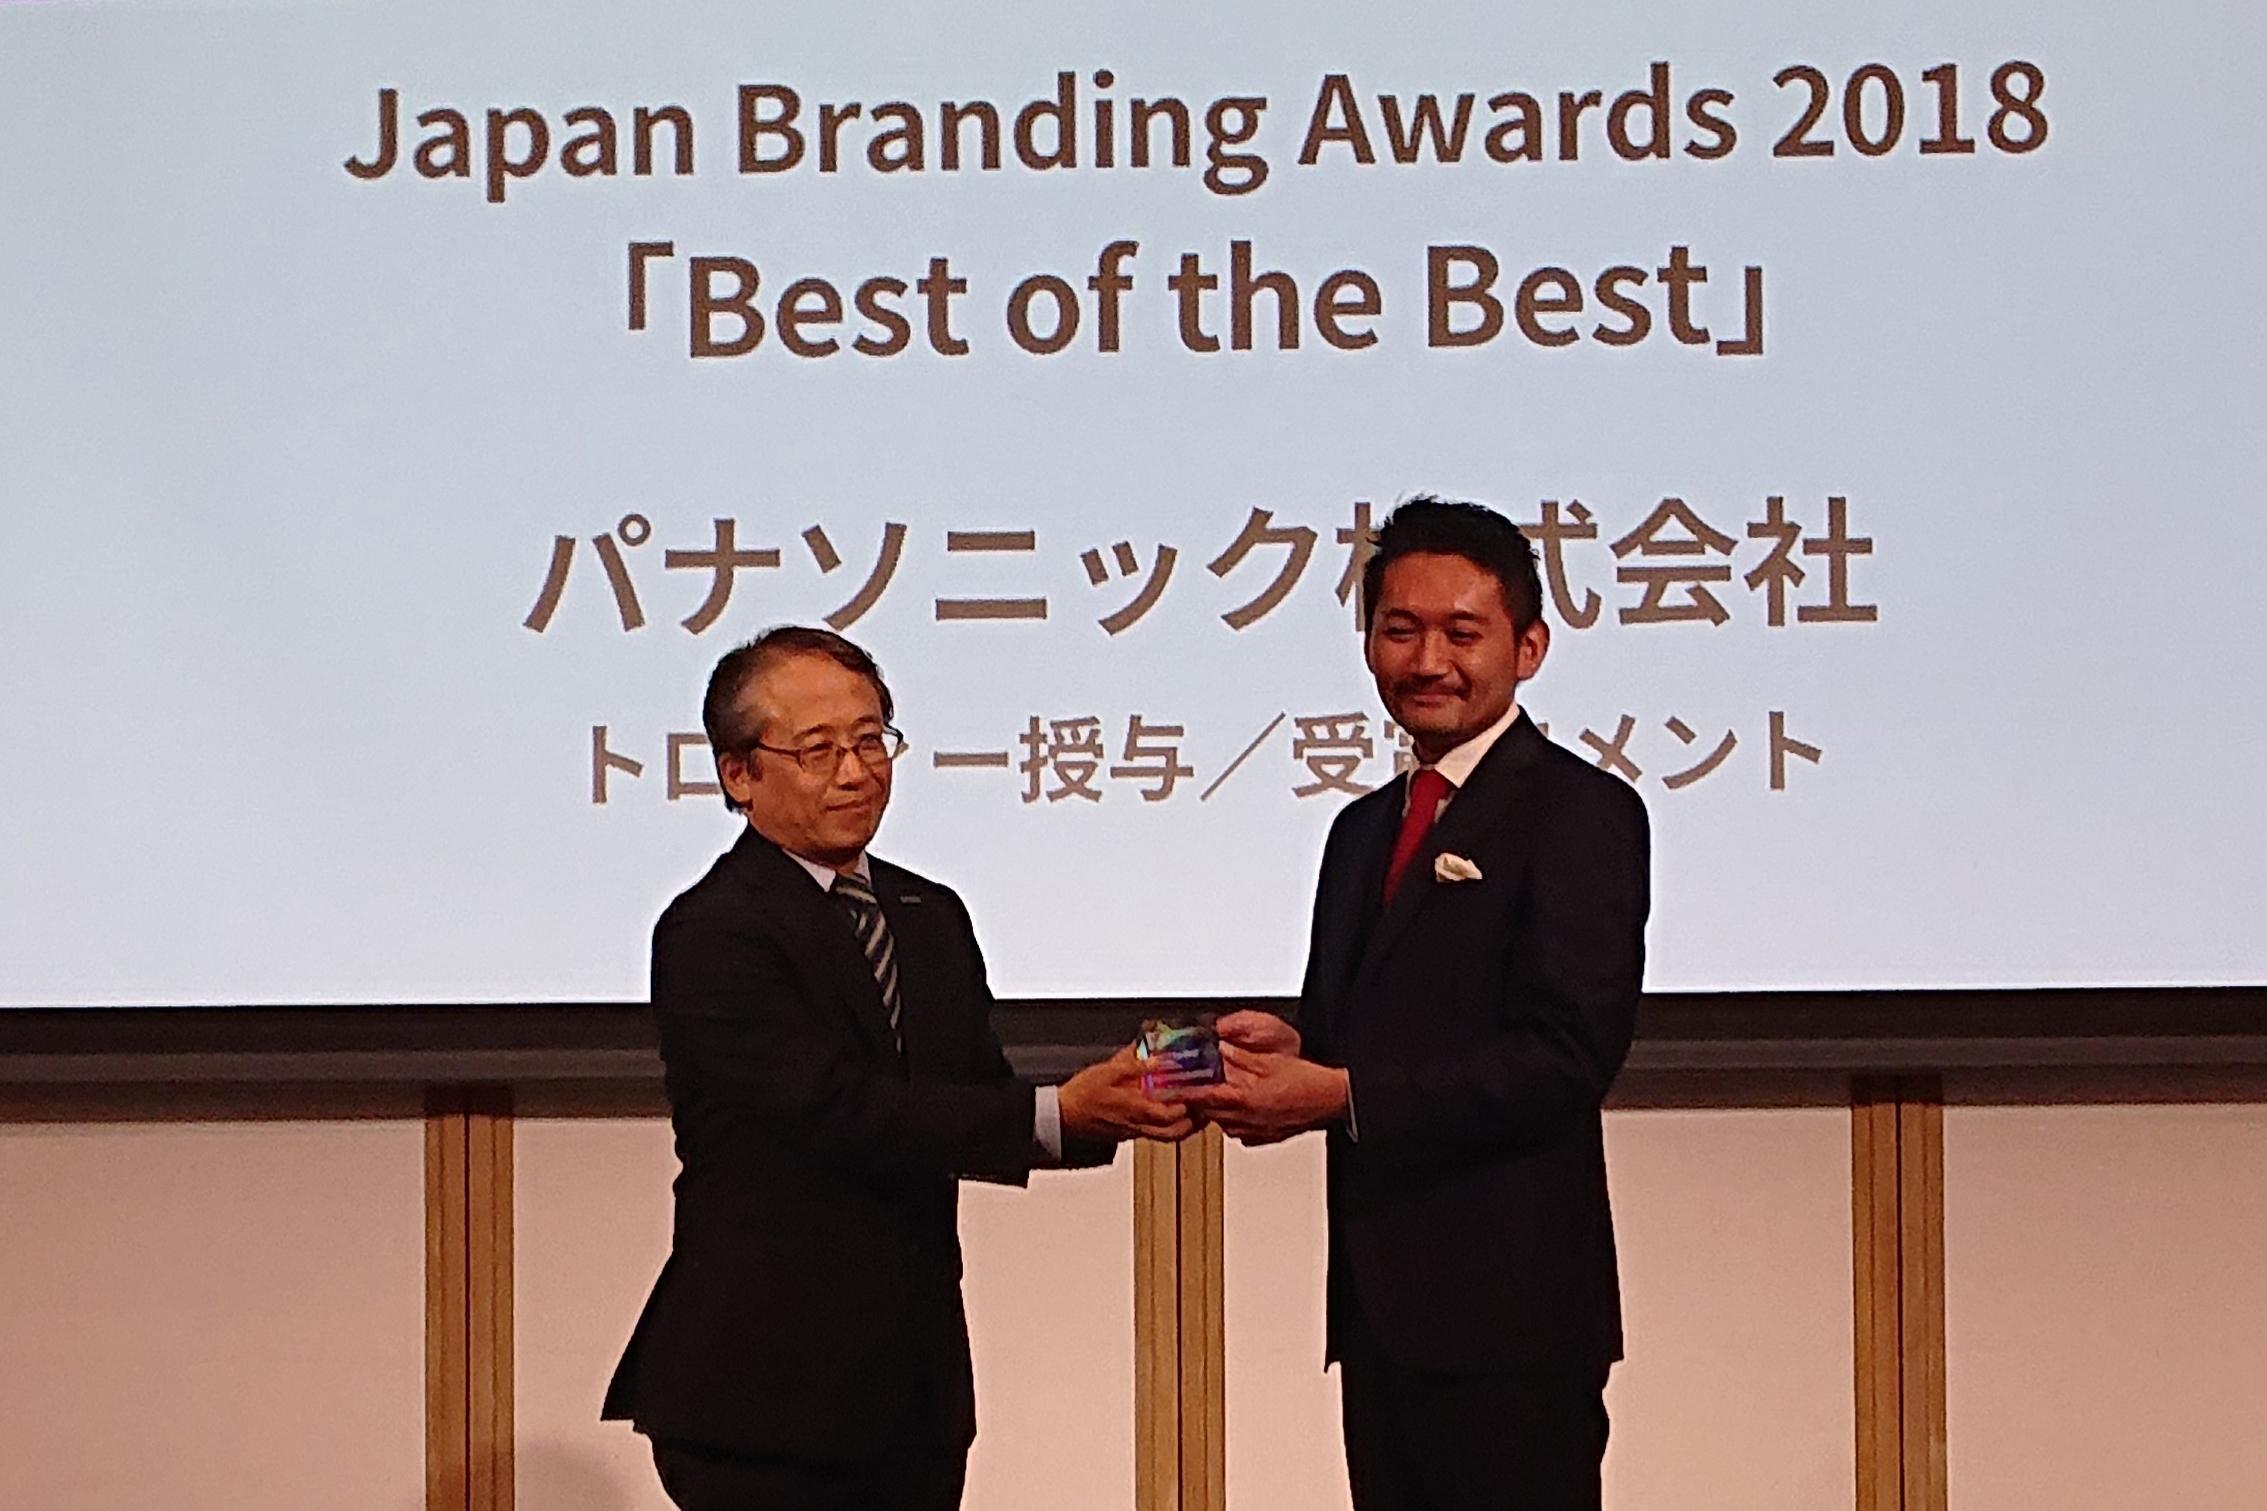 photo: The Japan Branding Awards 2018 award ceremony